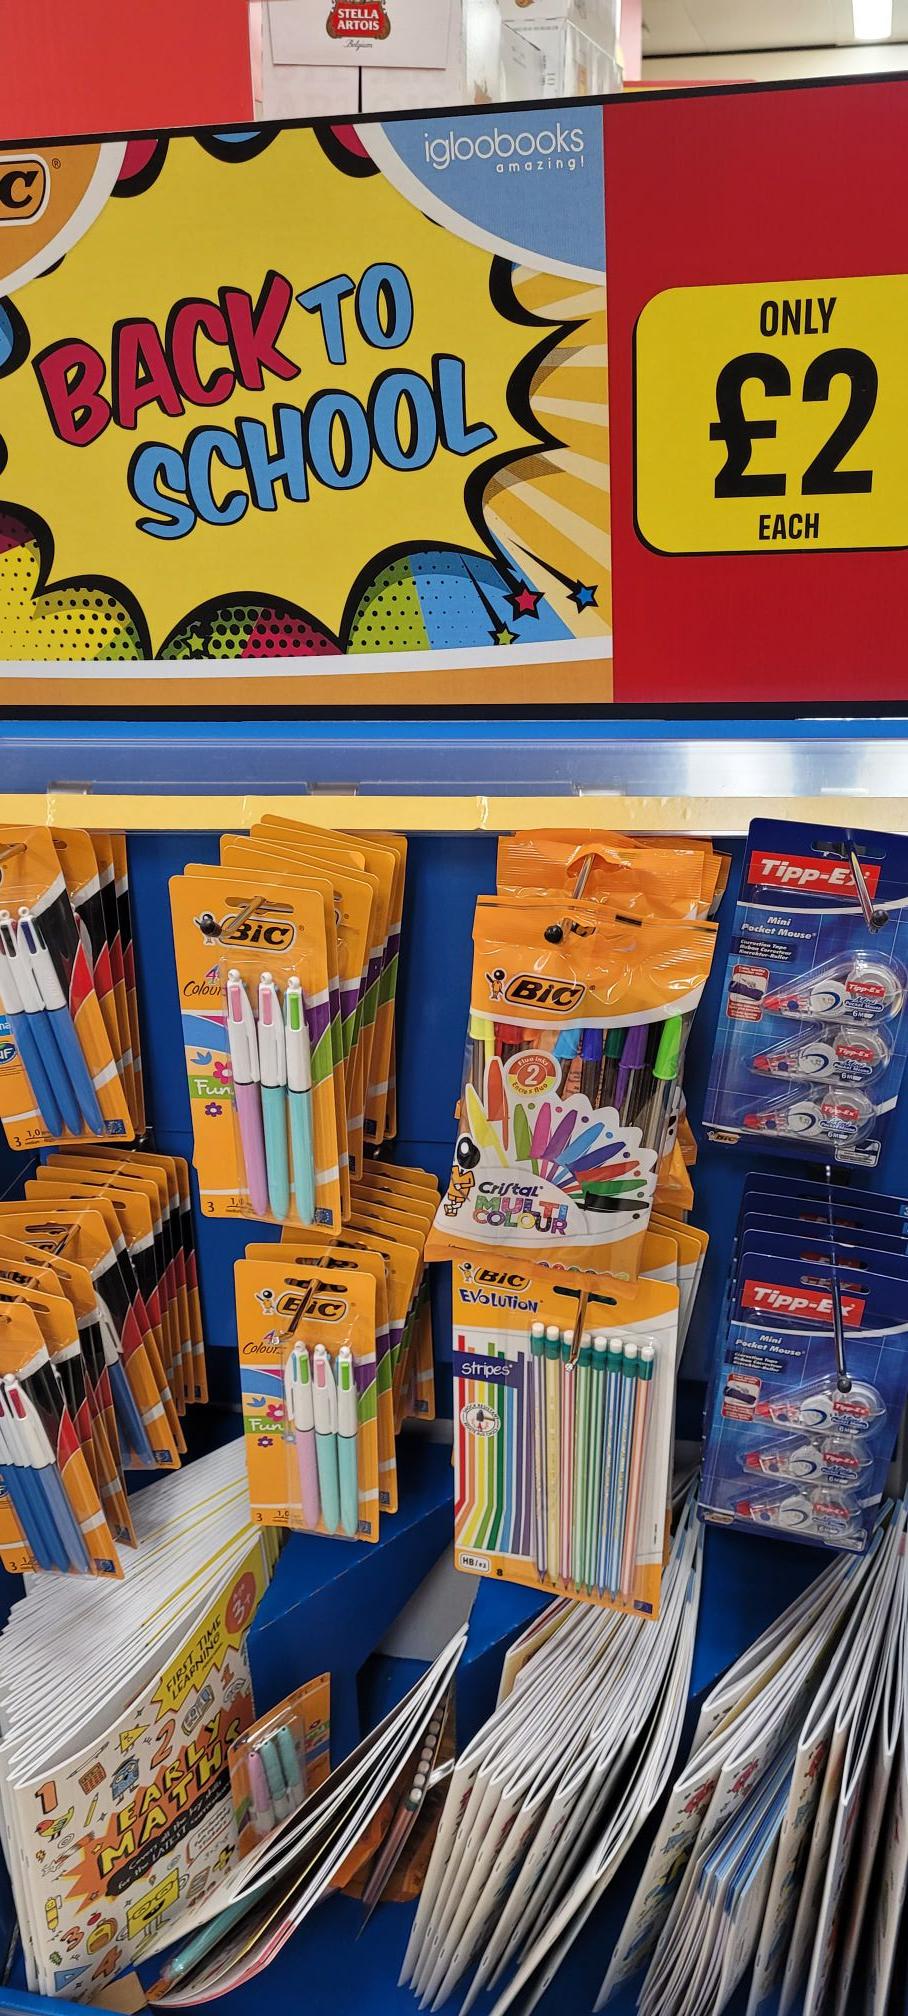 BiC 4 colours pens instore - £2 @ Iceland (Luton)